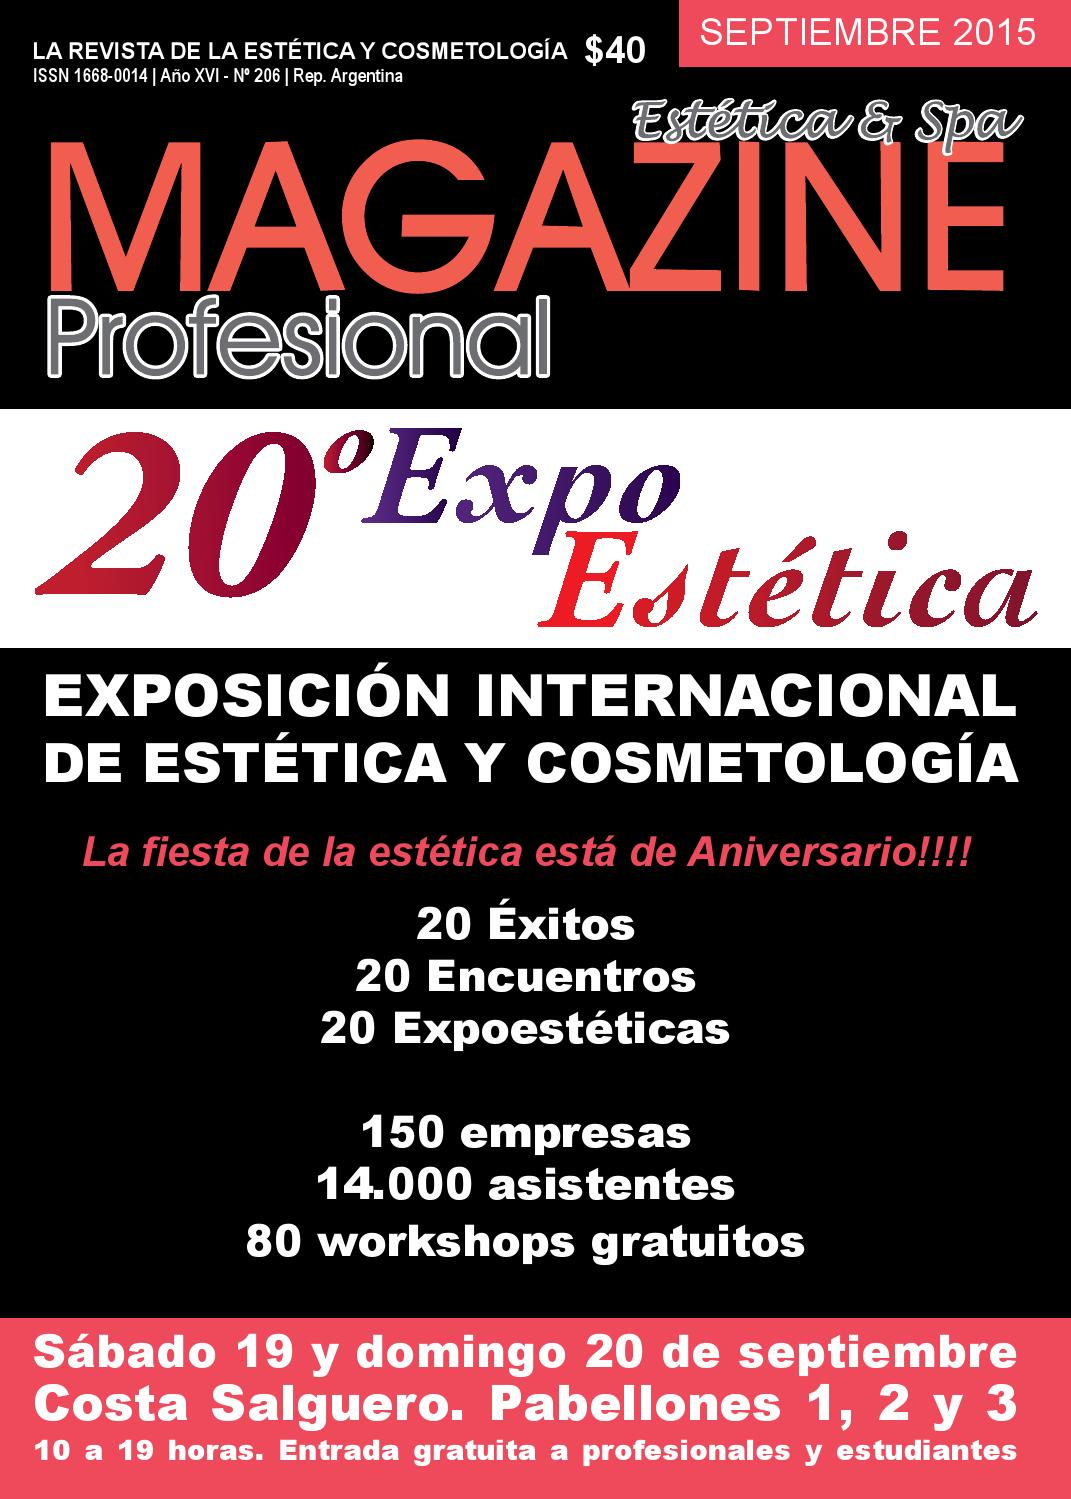 206 septiembre 2015 by Revista Magazine Profesional - issuu